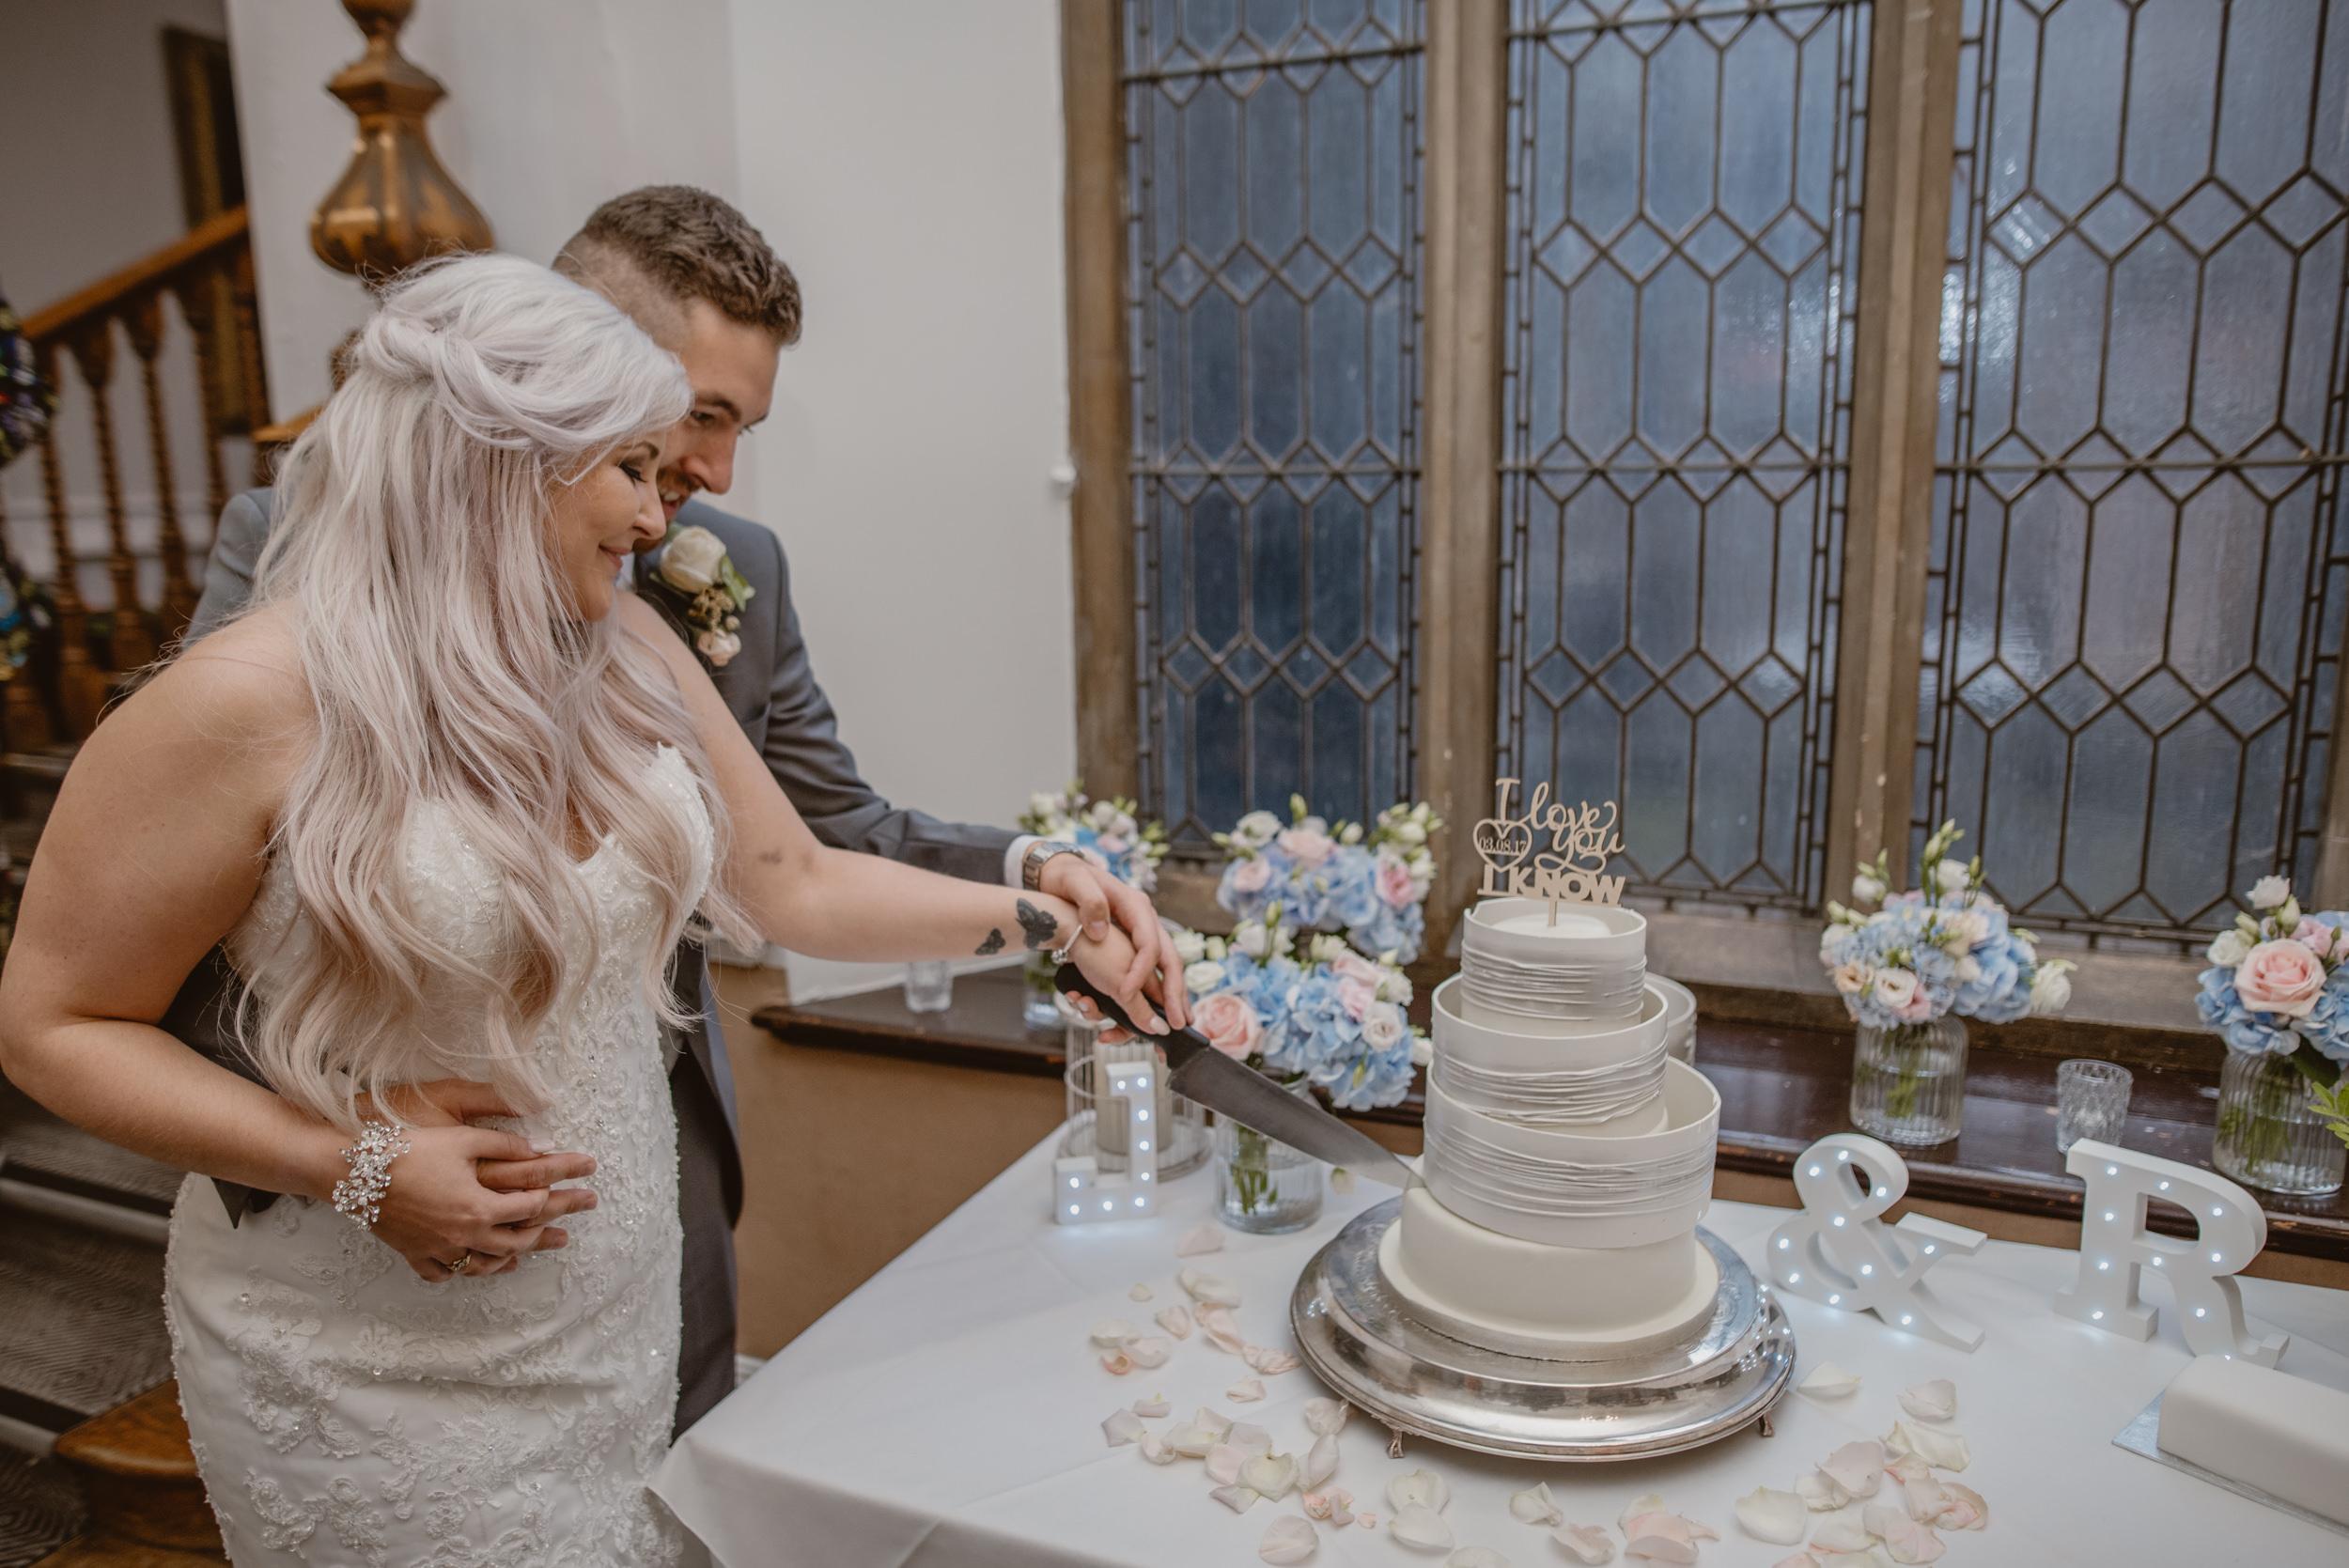 Rachel-and-James-Wedding-Horsley-Towers-State-Manu-Mendoza-Wedding-Photography-512.jpg